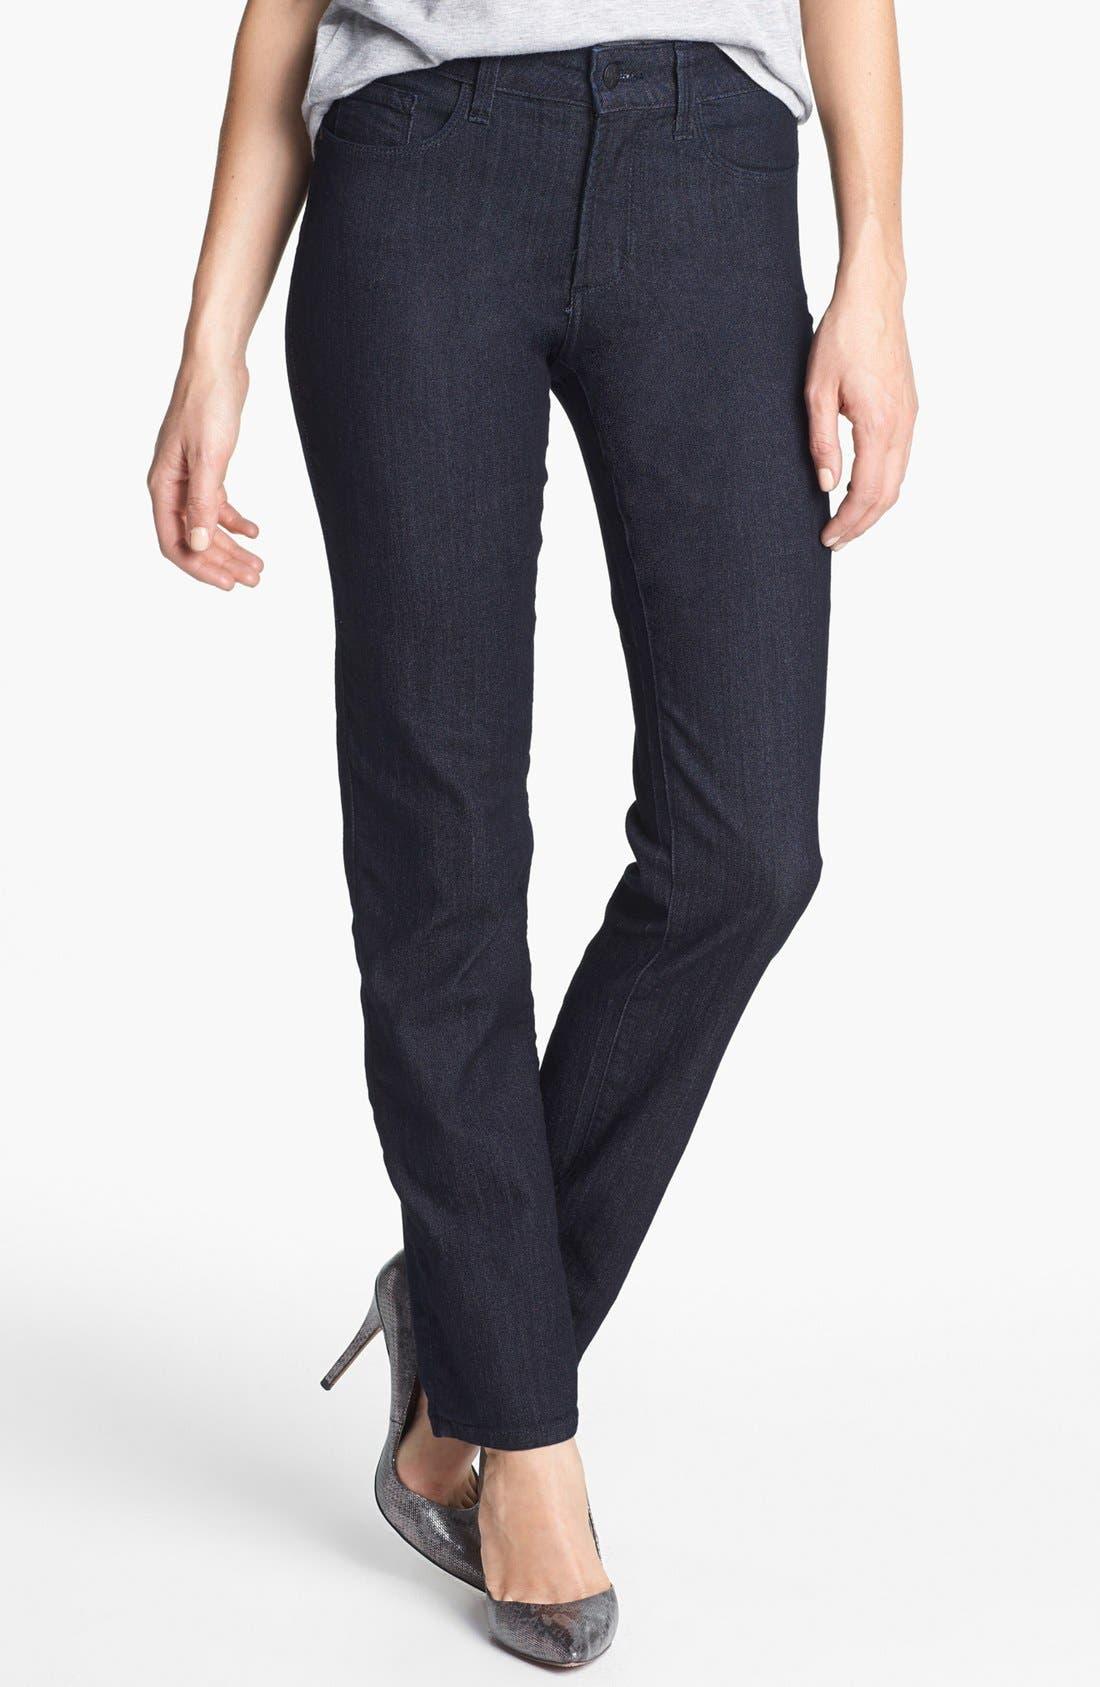 Main Image - NYDJ 'Sheri' Stretch Skinny Jeans (Petite)